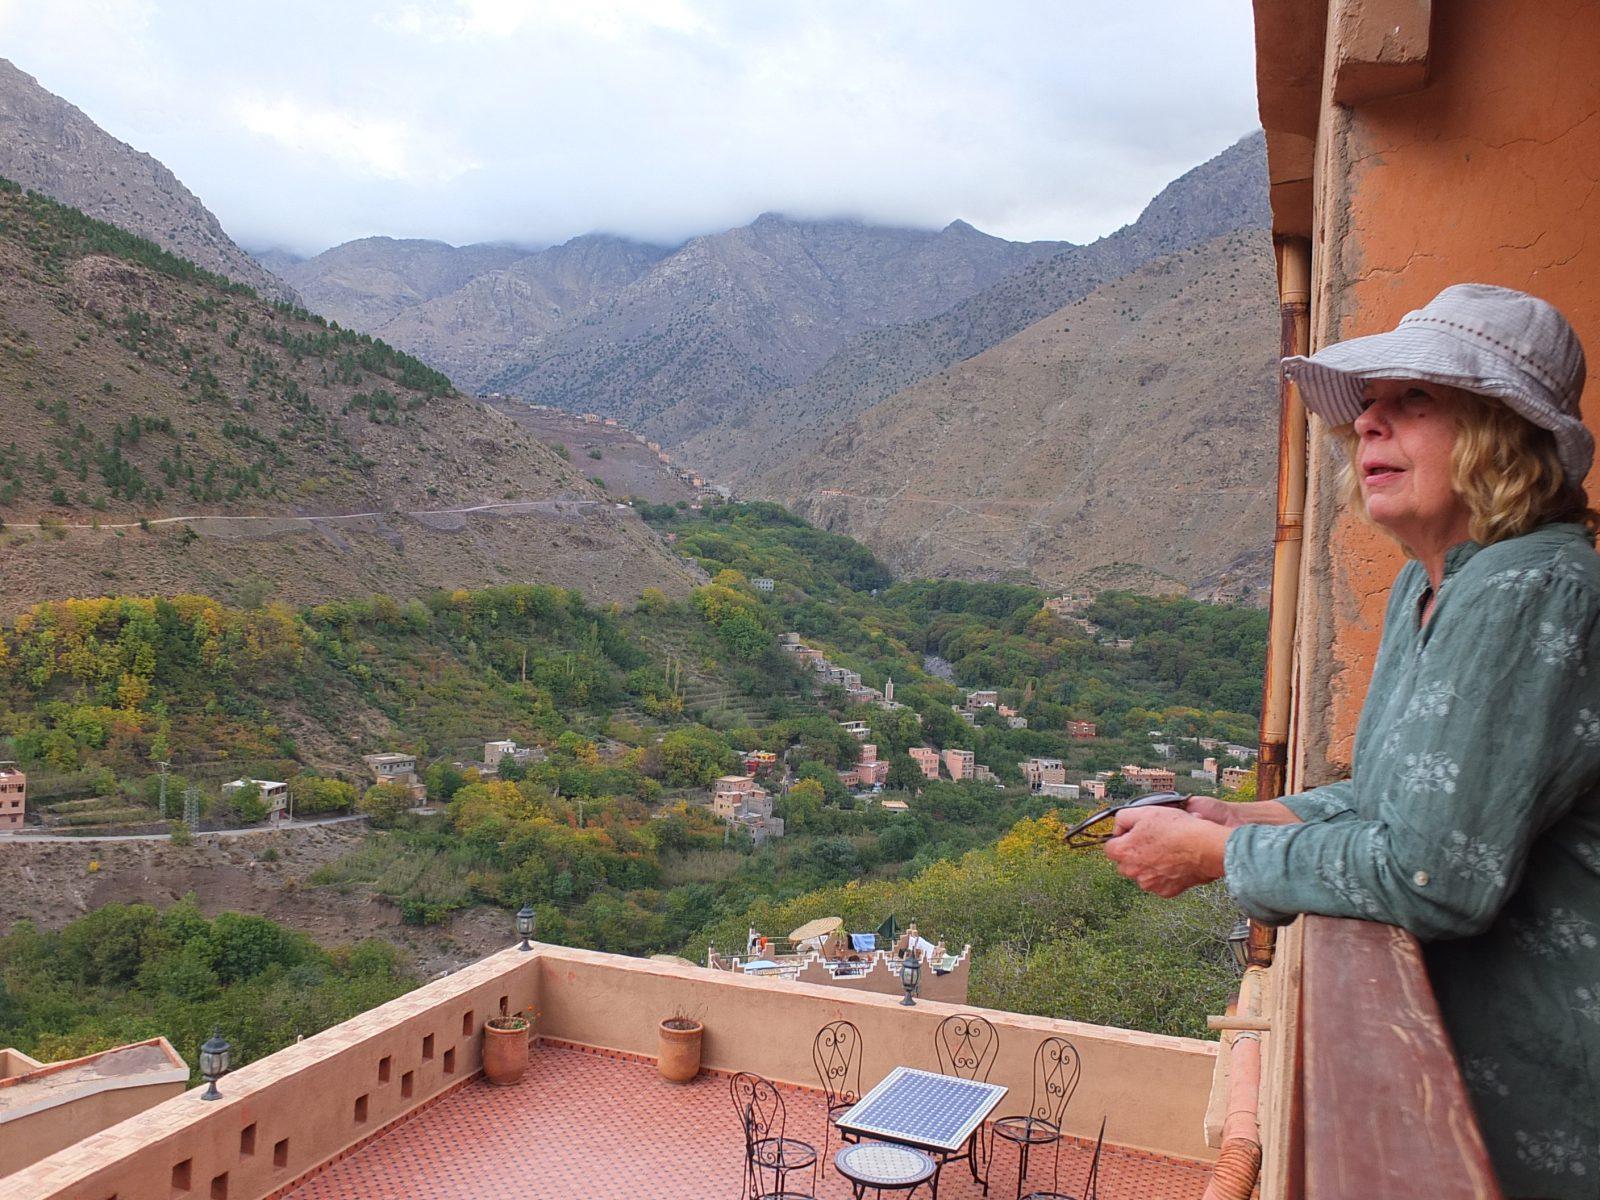 Dag 08 - Marokko Hoge Atlas wandelen 50+